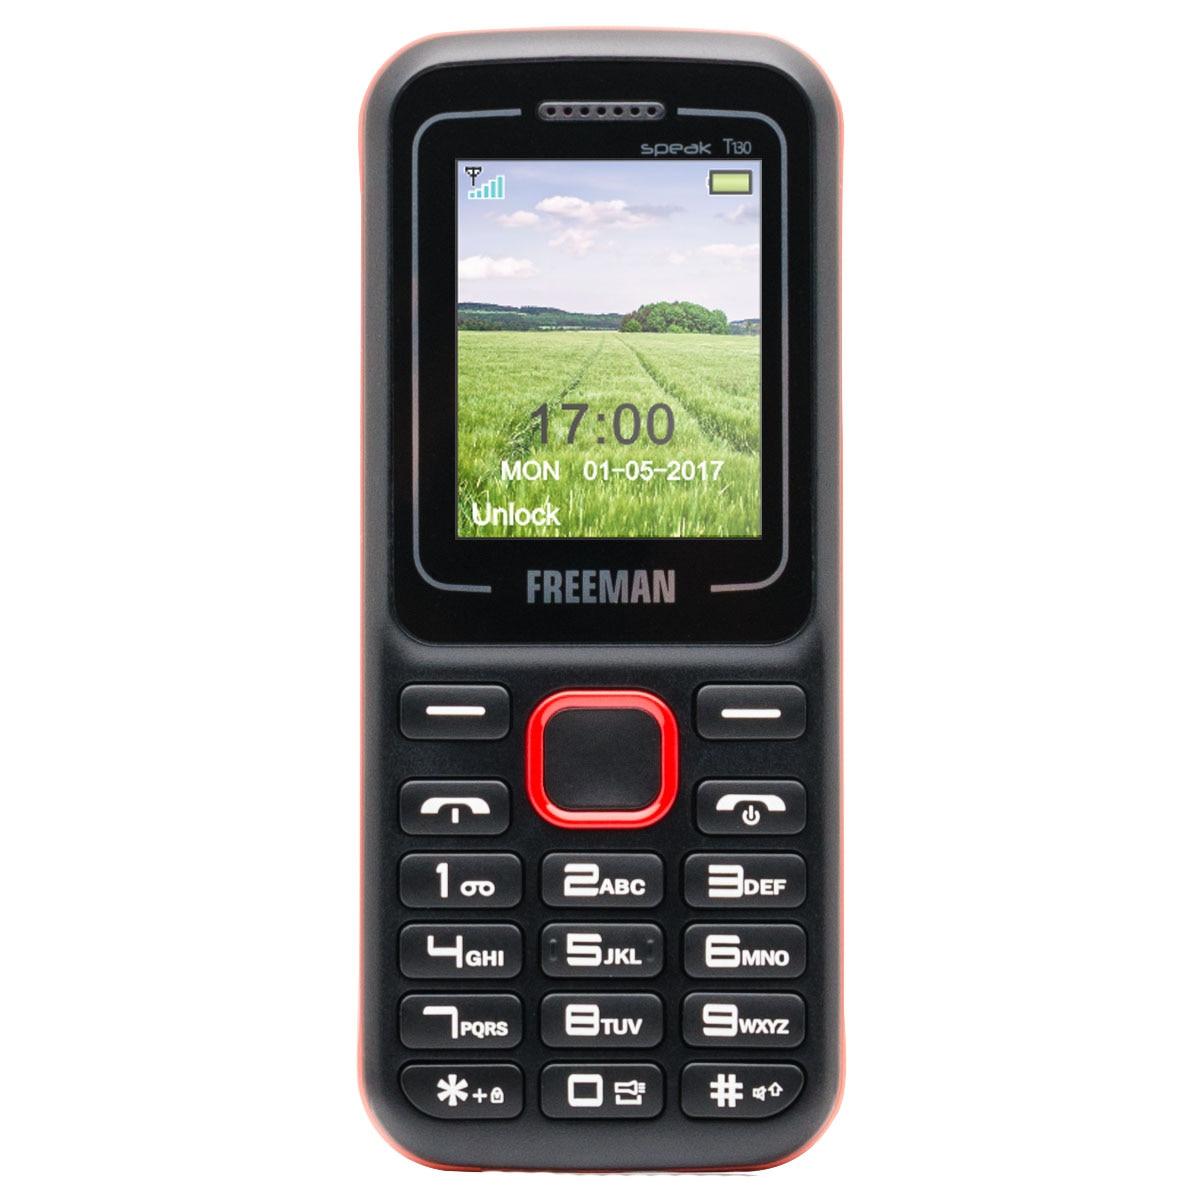 Fotografie Telefon mobil Freeman Speak T130, Dual SIM, Black/Red